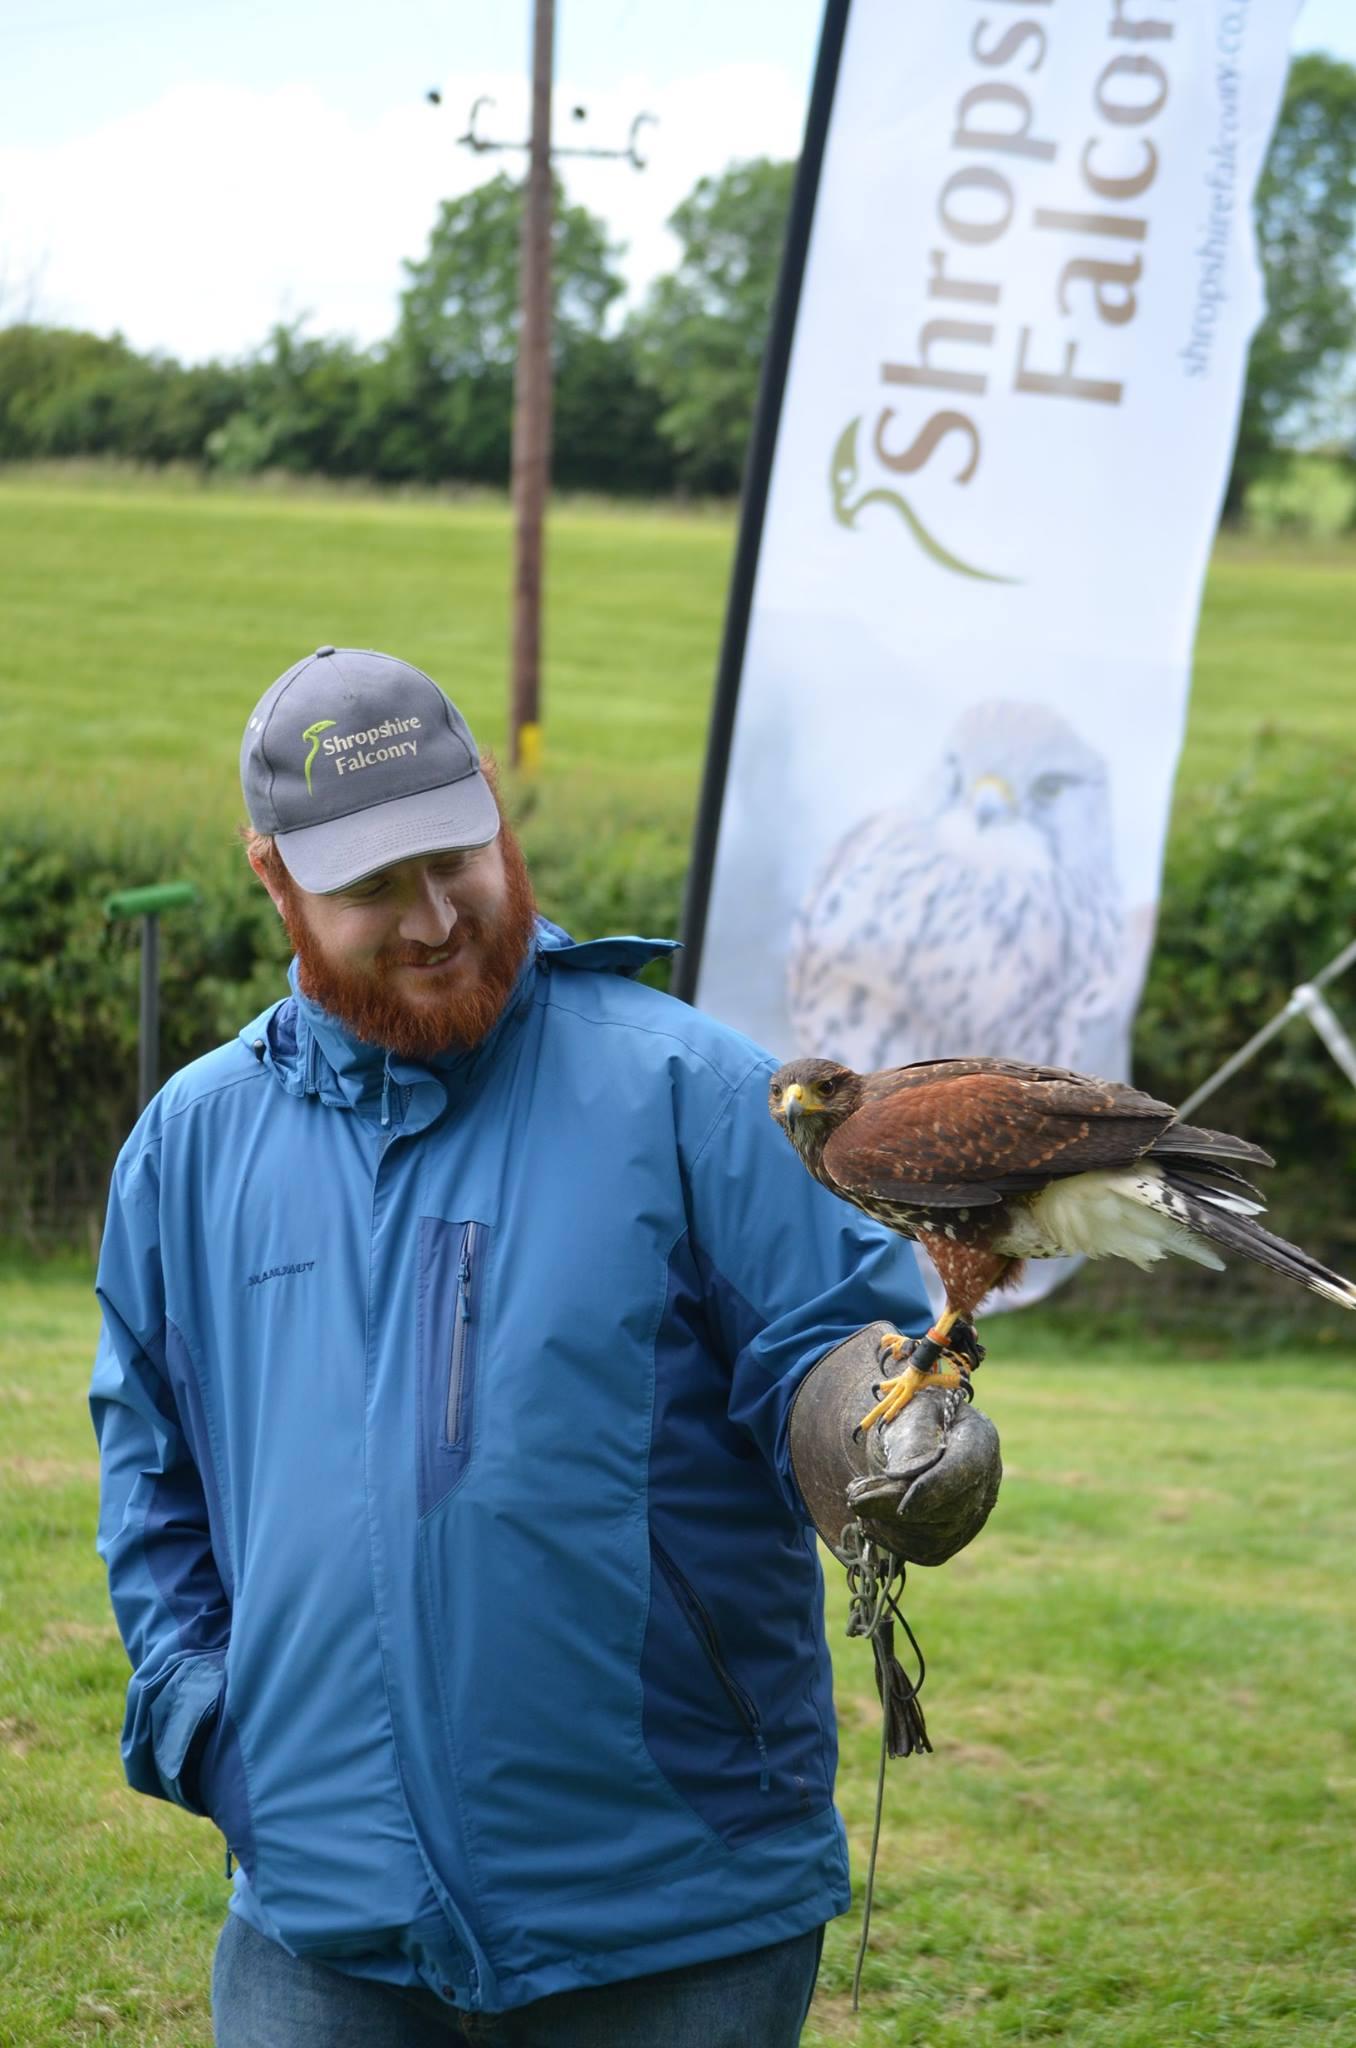 Open Farm Event at Winston Farm Ellesmere